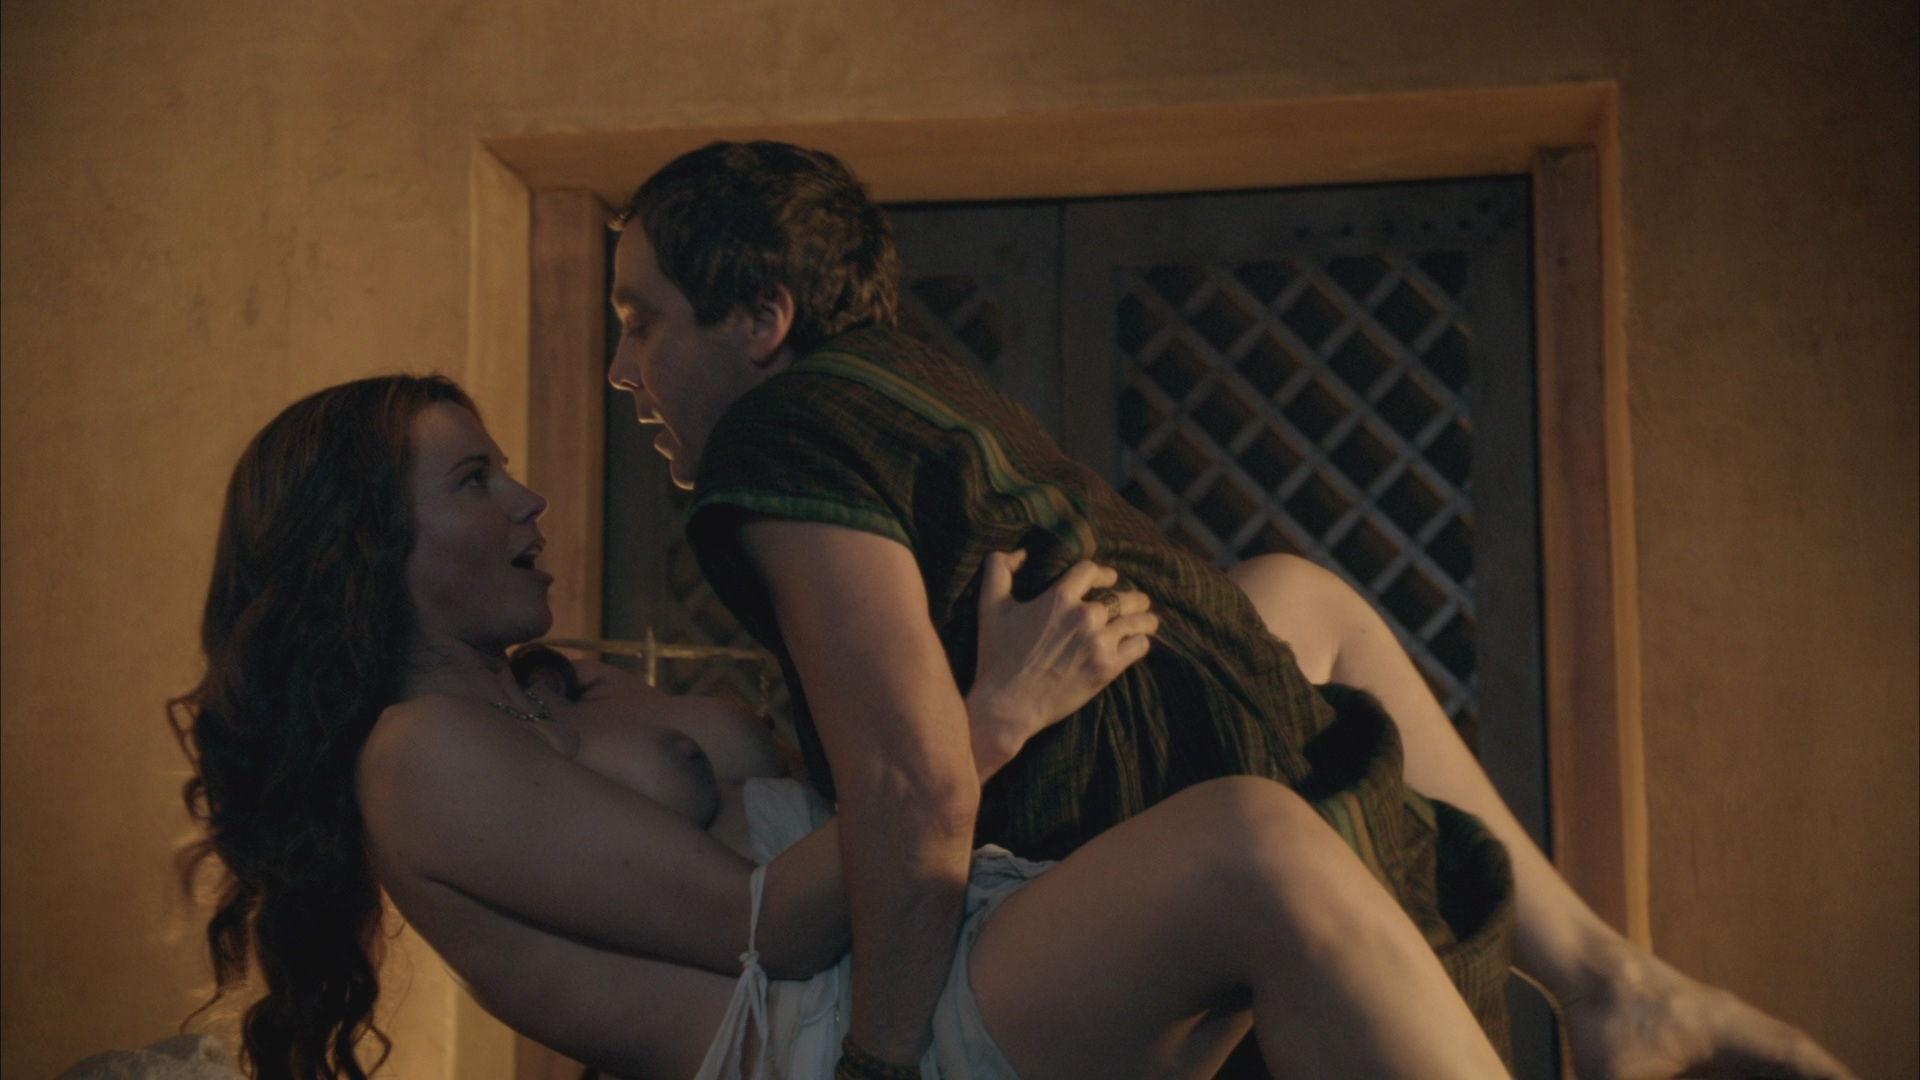 Adult english movie, hottest naked girl photos